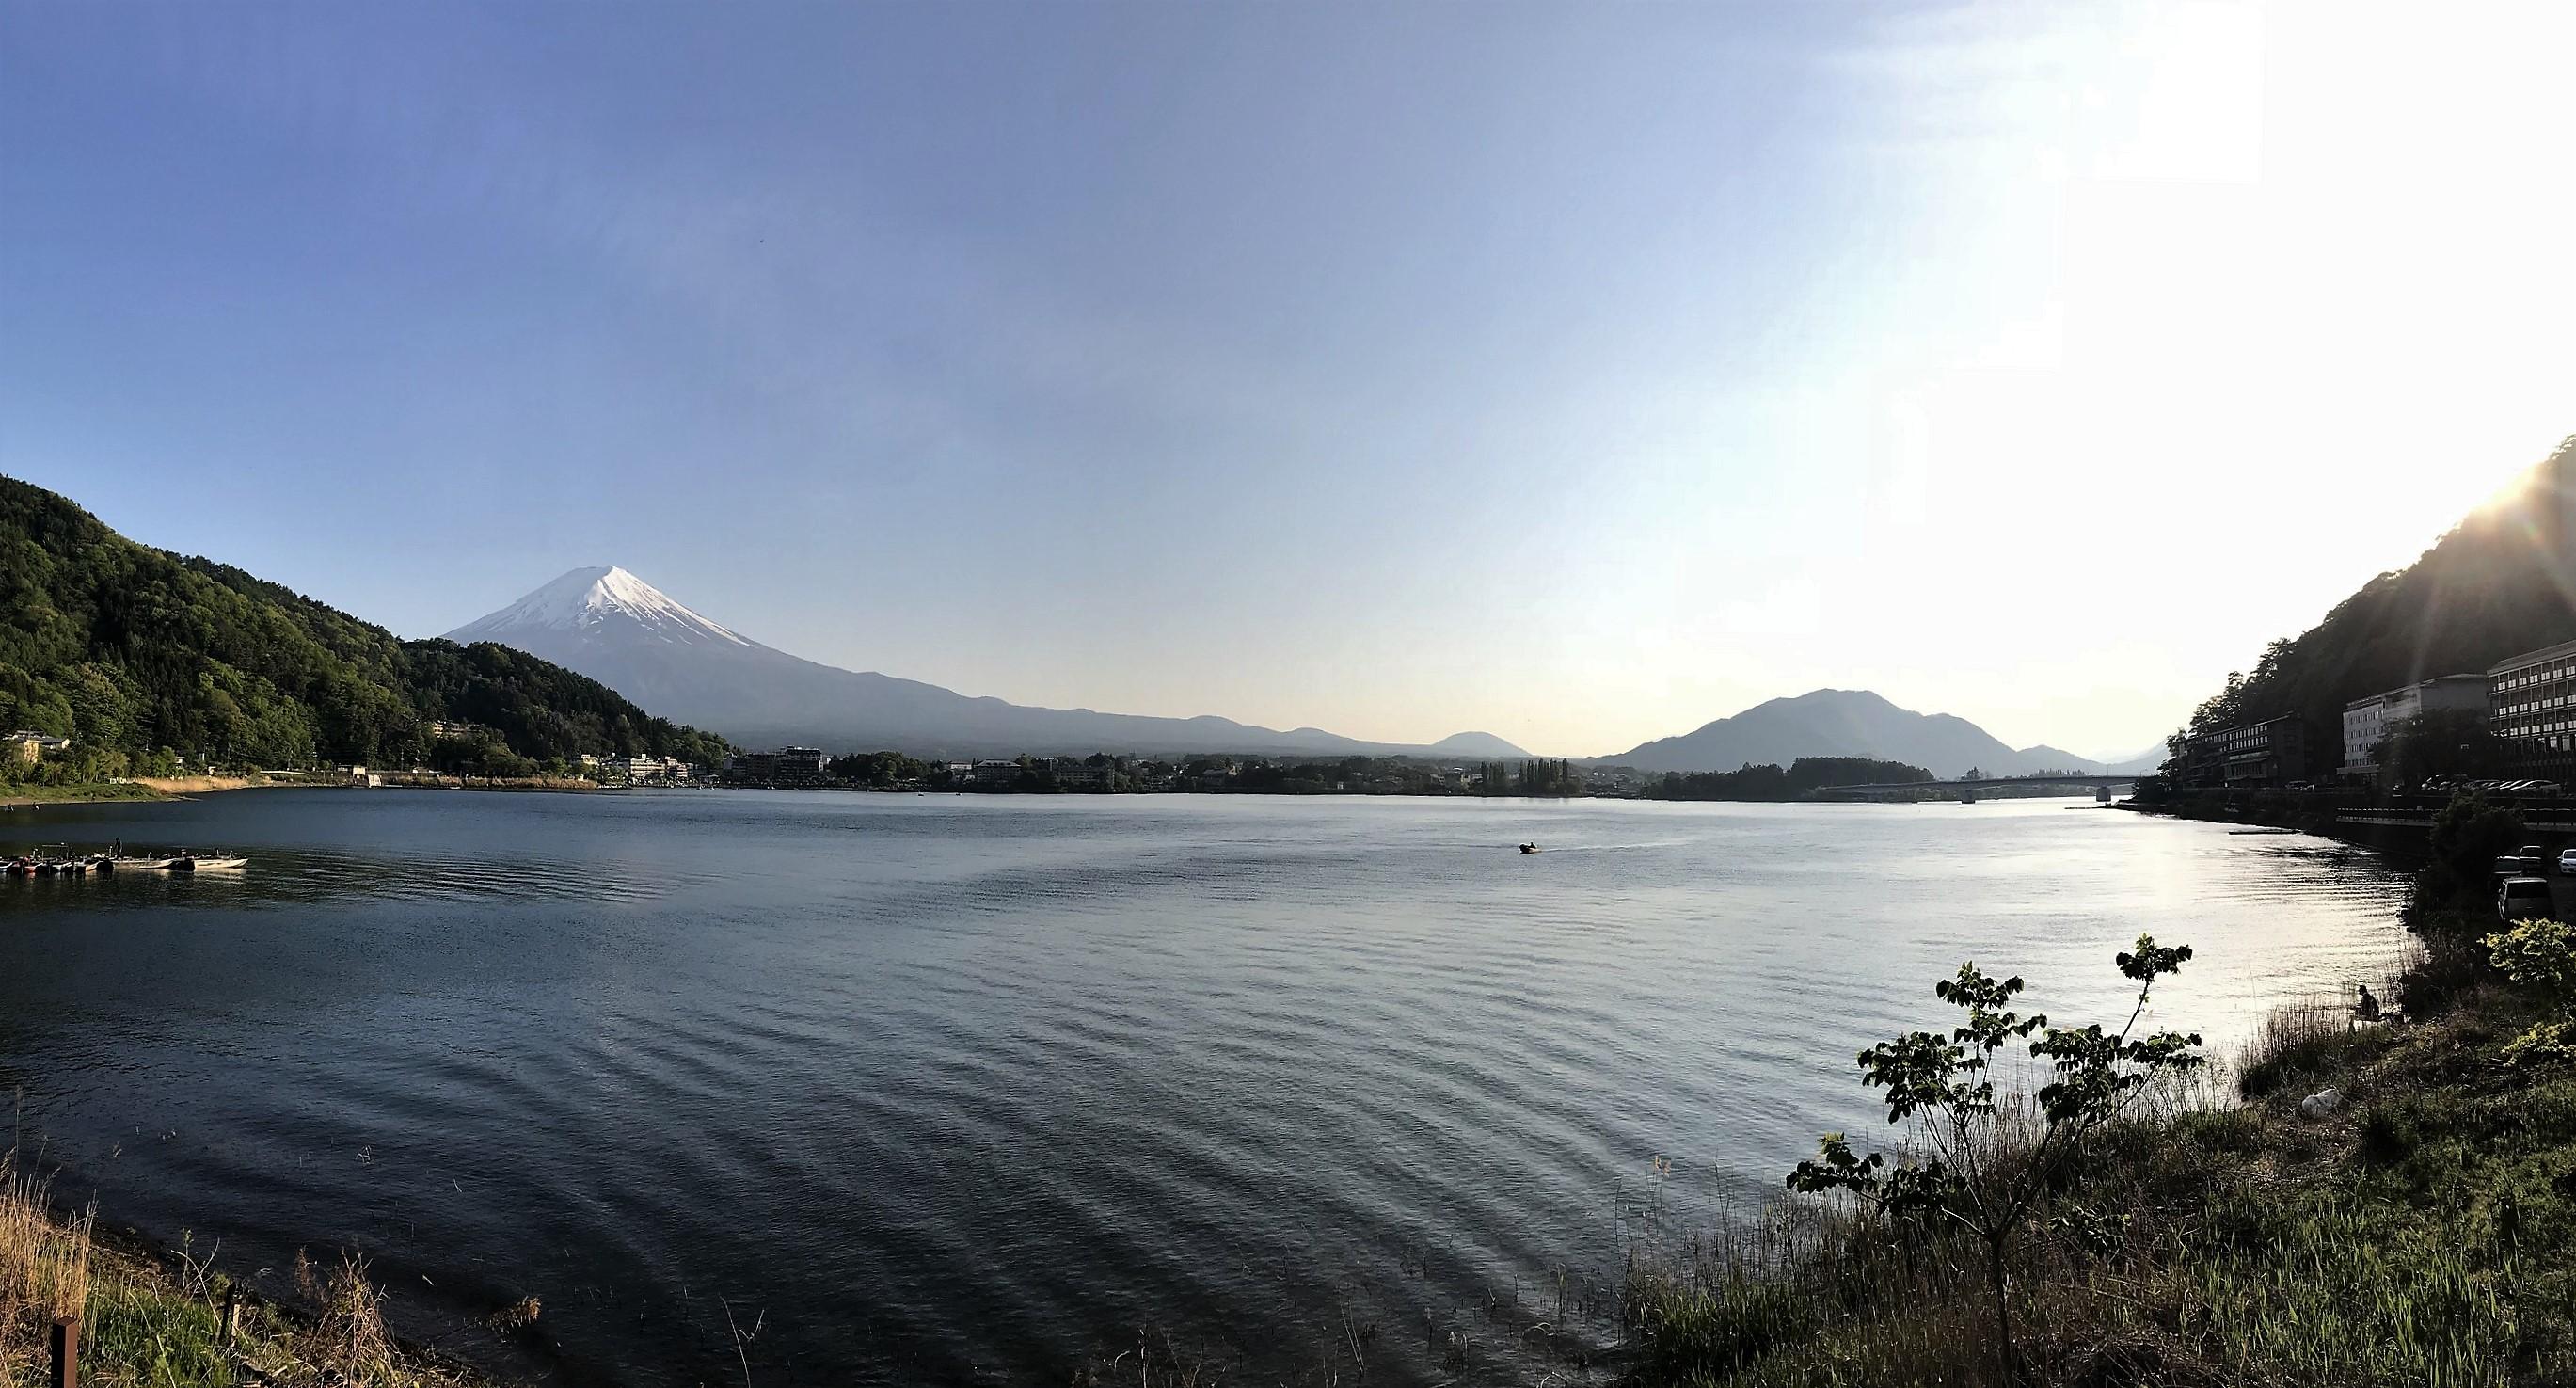 Lake Kawaguchiko mount fuji panorama